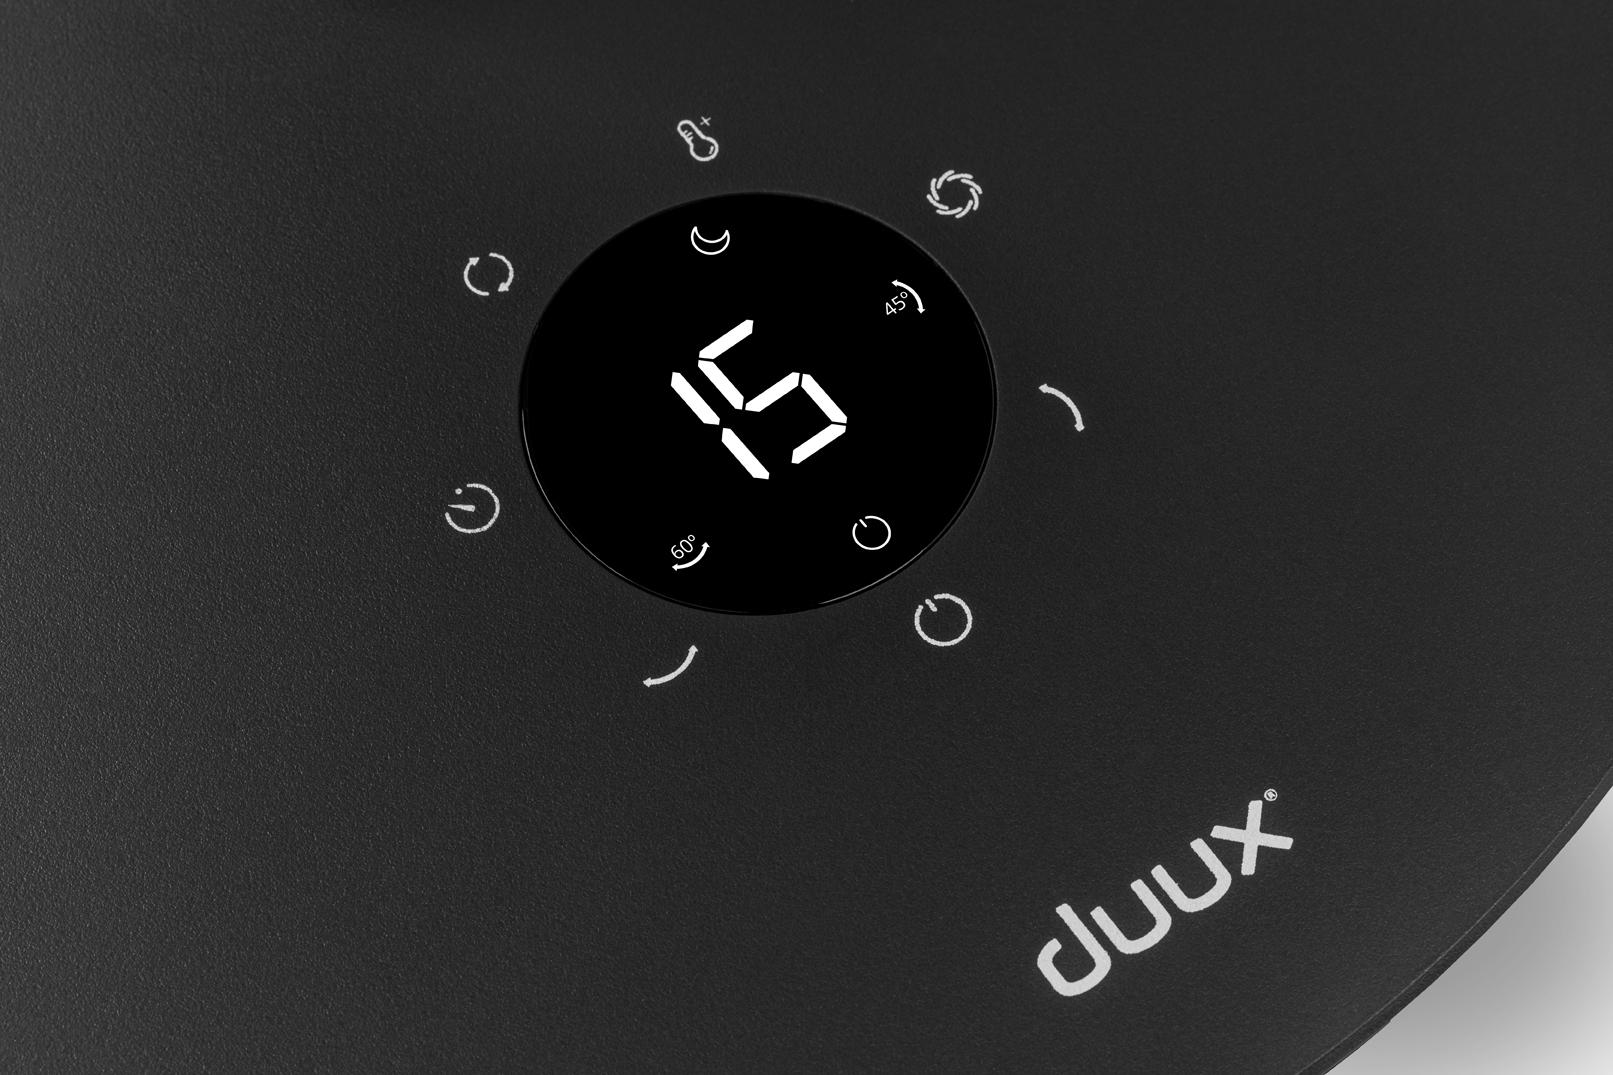 duux(デュクス)Whisper Flex Touch(ウィスパー フレックス タッチ)27センチ リビング扇 グレー